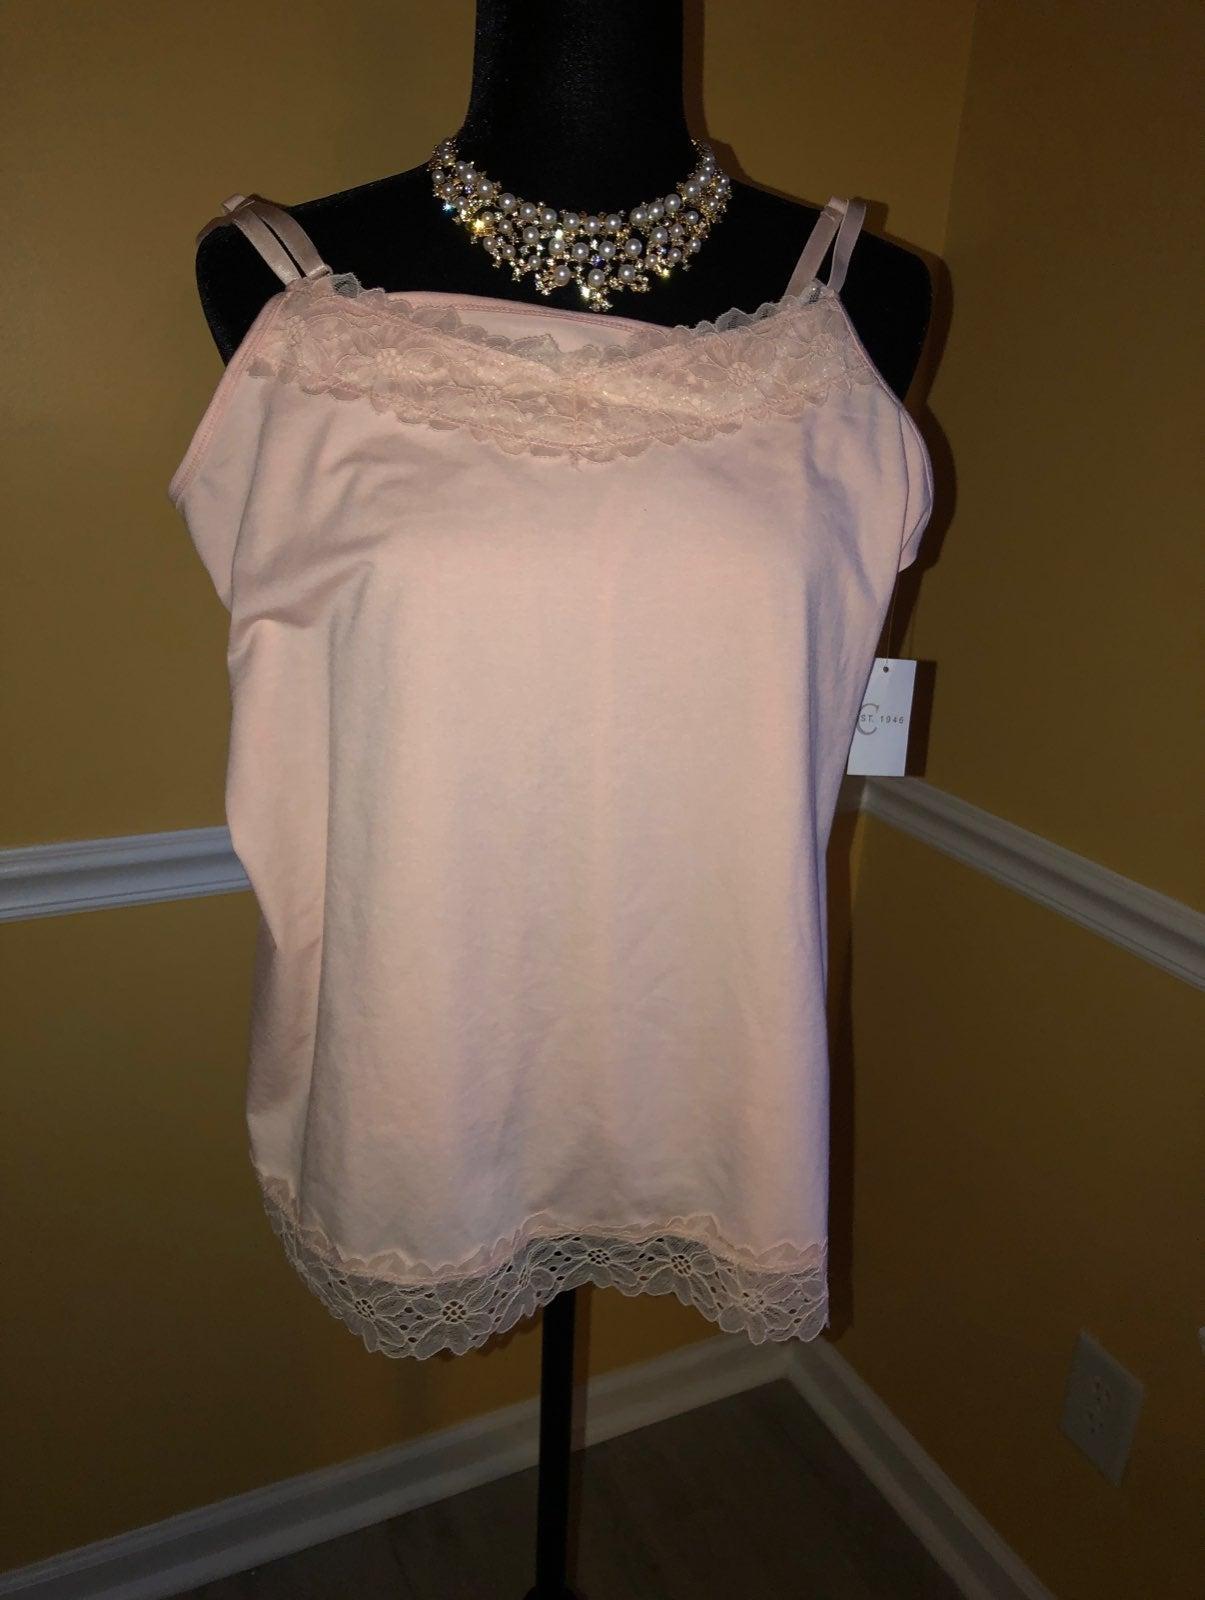 Lace Camisole Top w/Lace Hem